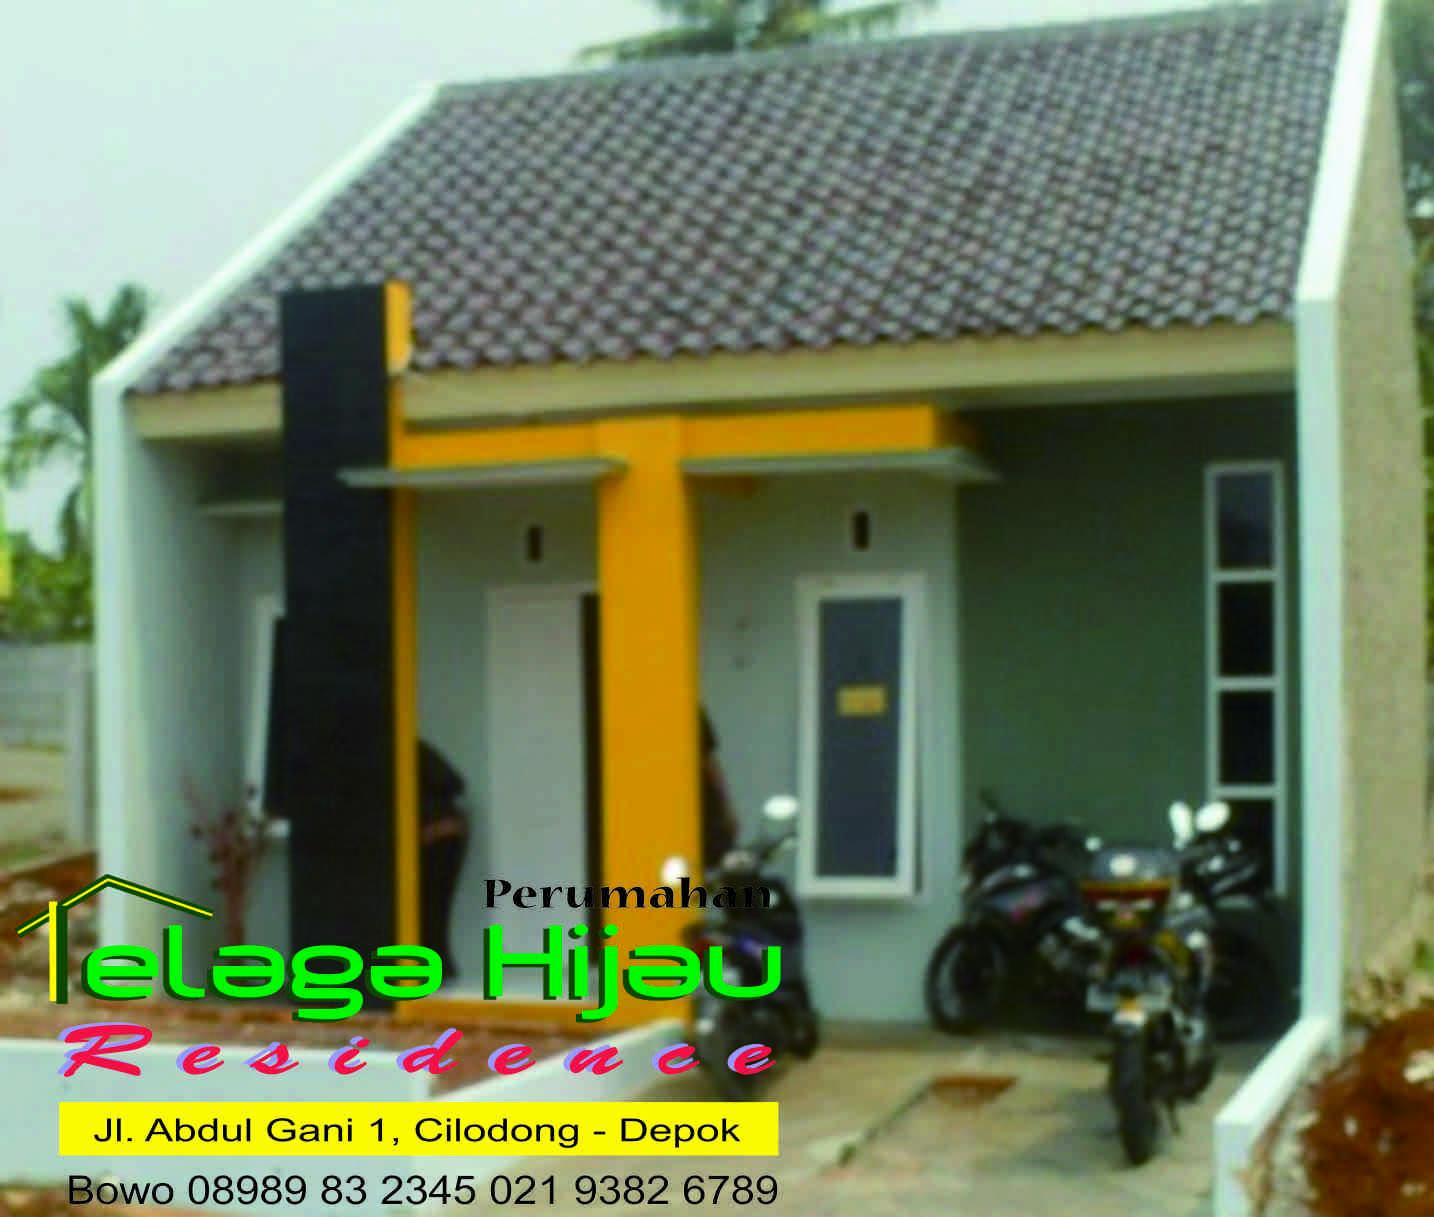 Depok Rumah Dijual Kpr Btn Perumahan Harga Murah